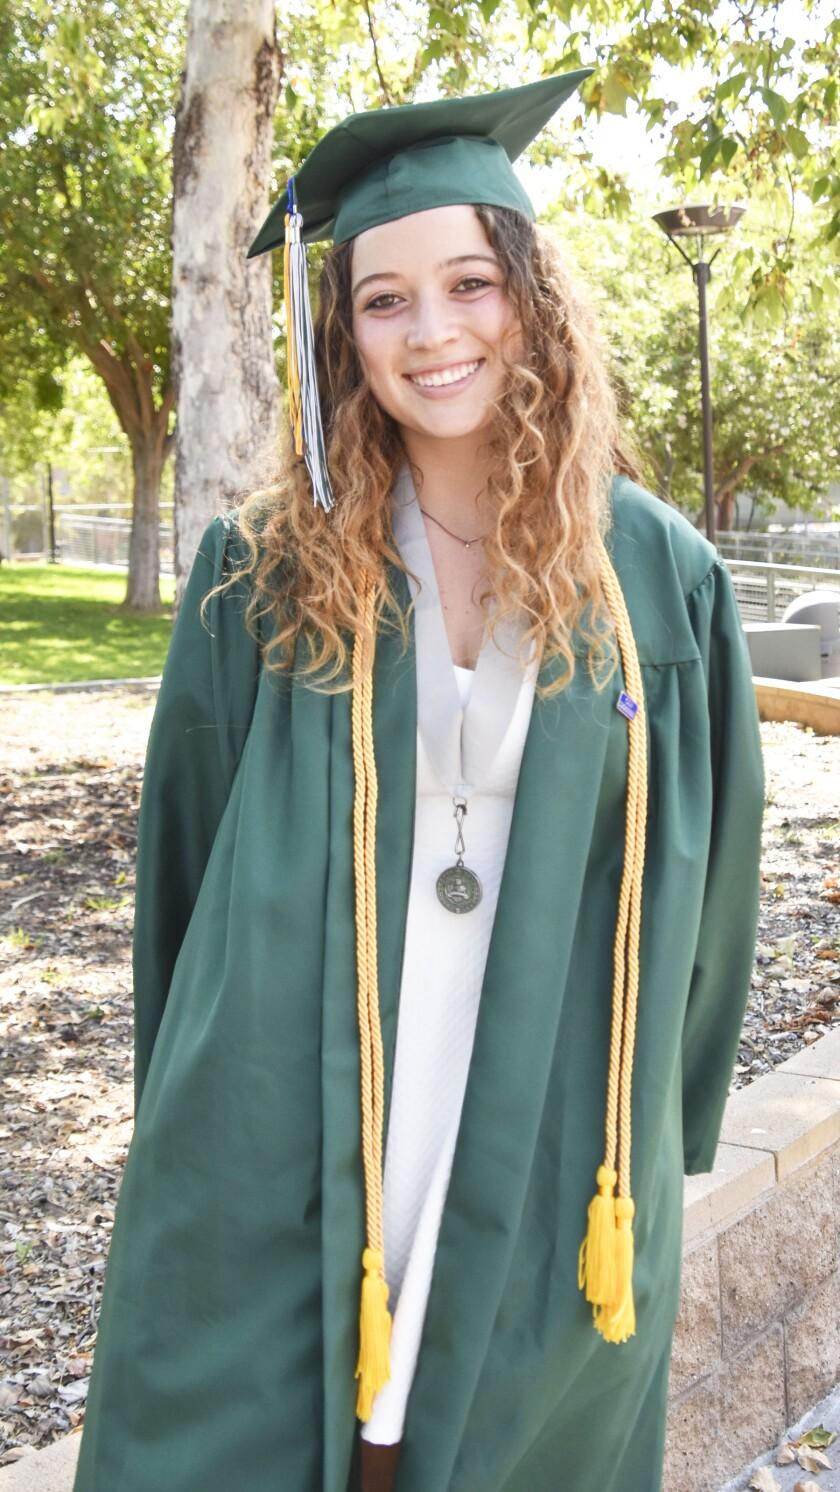 Poway High's 2021 valedictorian Kelly Couvrette.